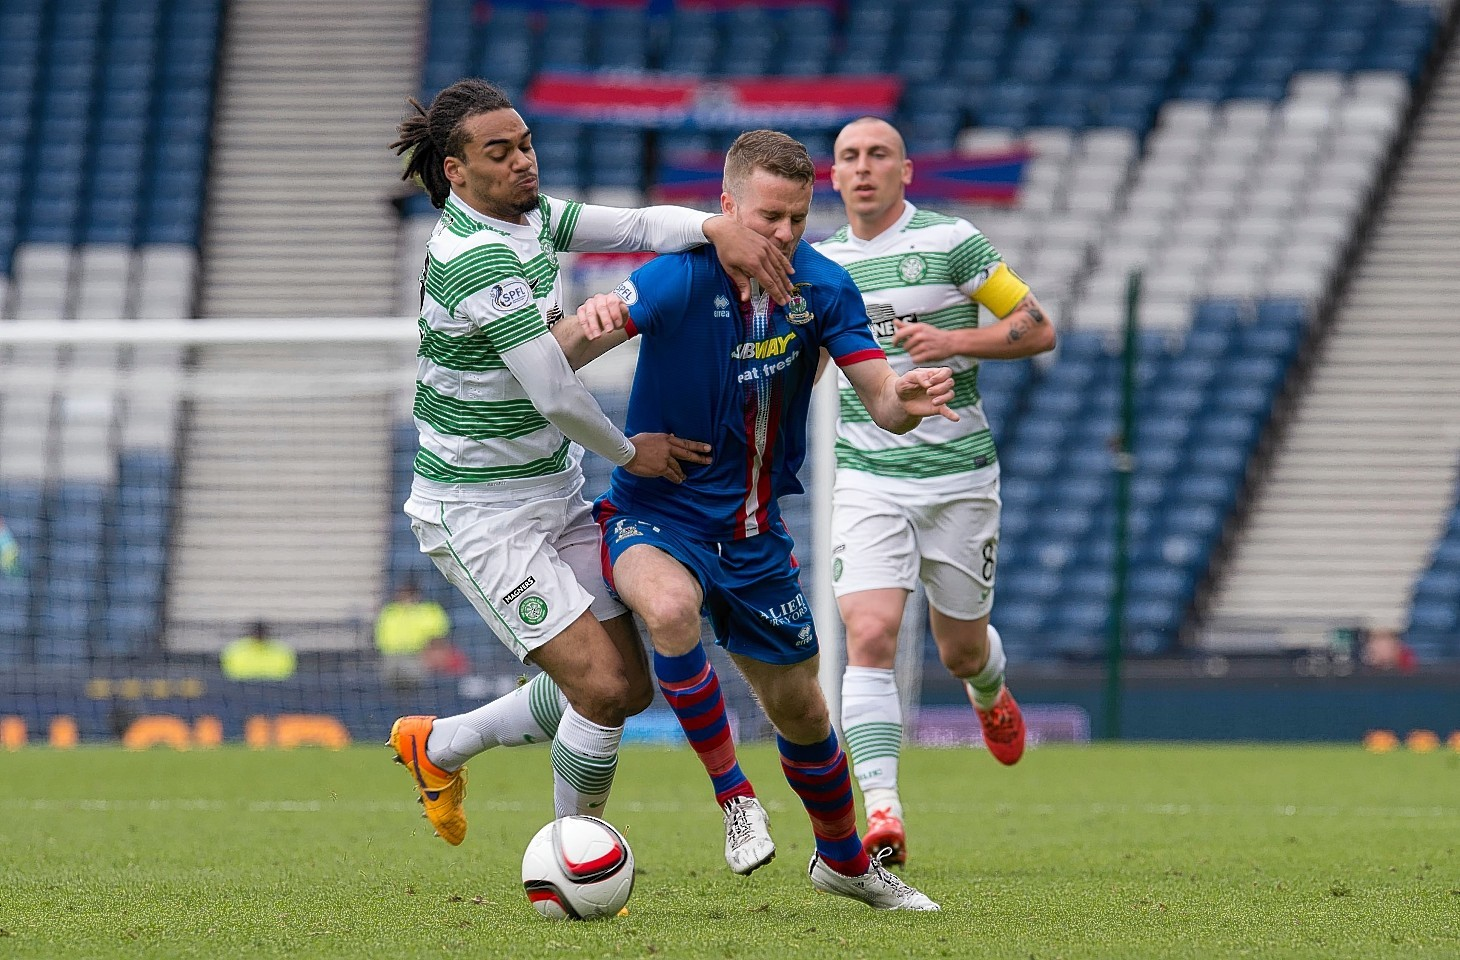 Celtic's Jason Denayer challenges Caley Thistle winger Marley Watkins